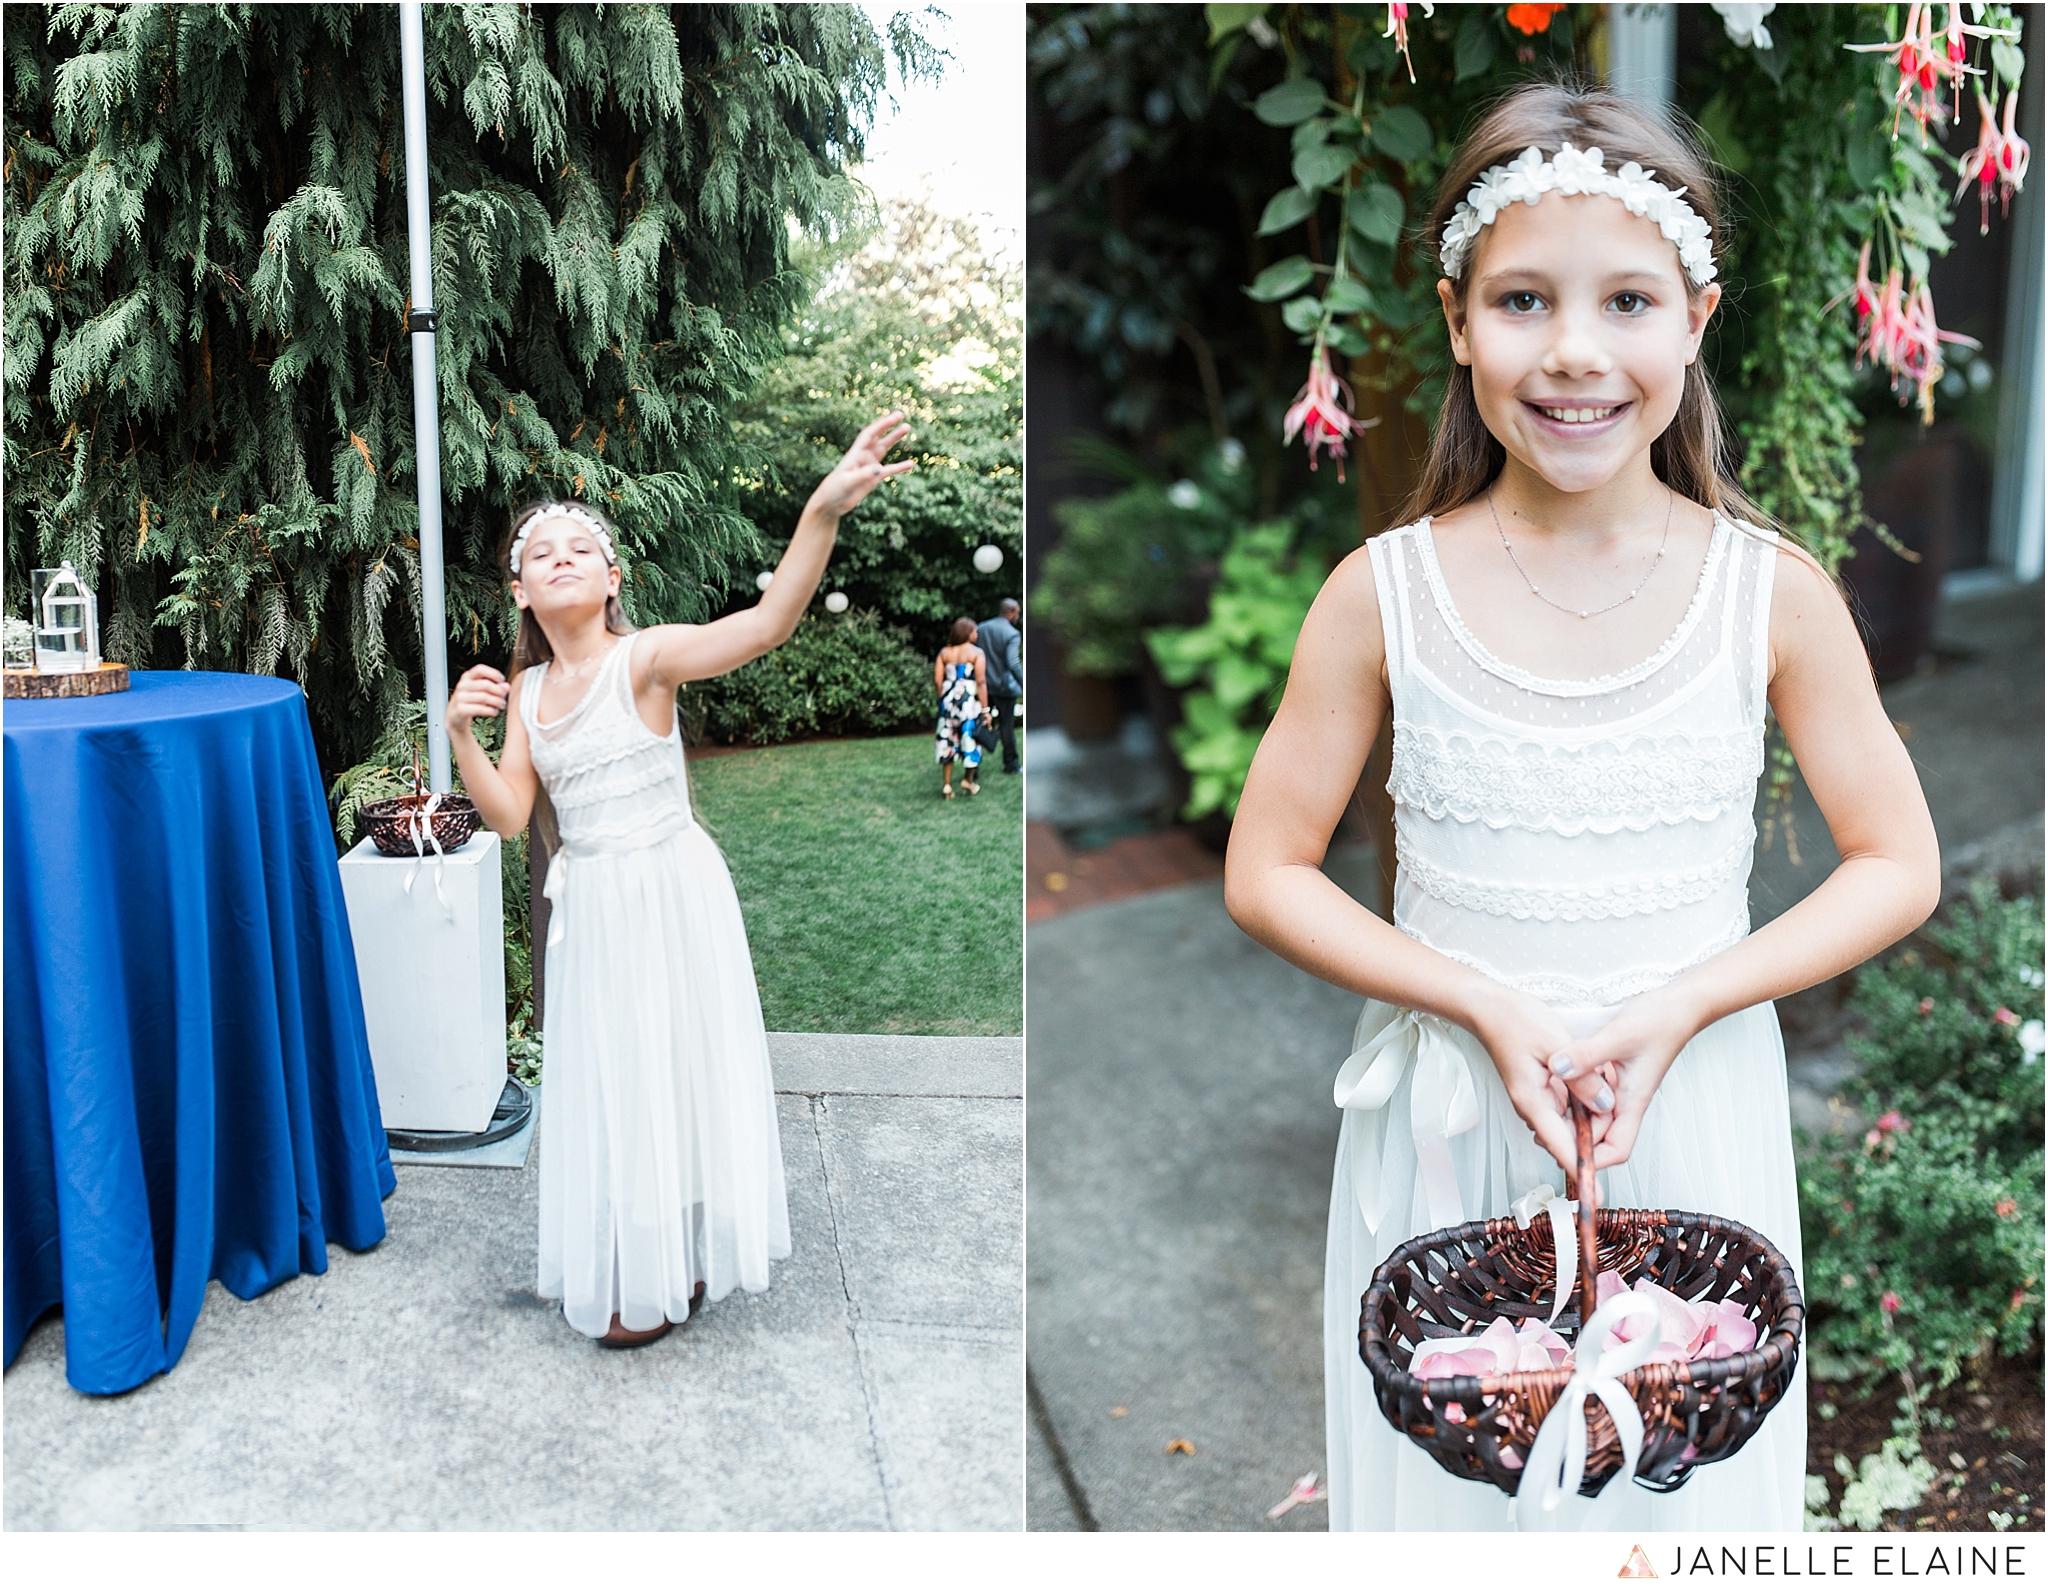 janelle elaine photography-professional wedding photographer-seattle-bellevue-robinswood house-123.jpg